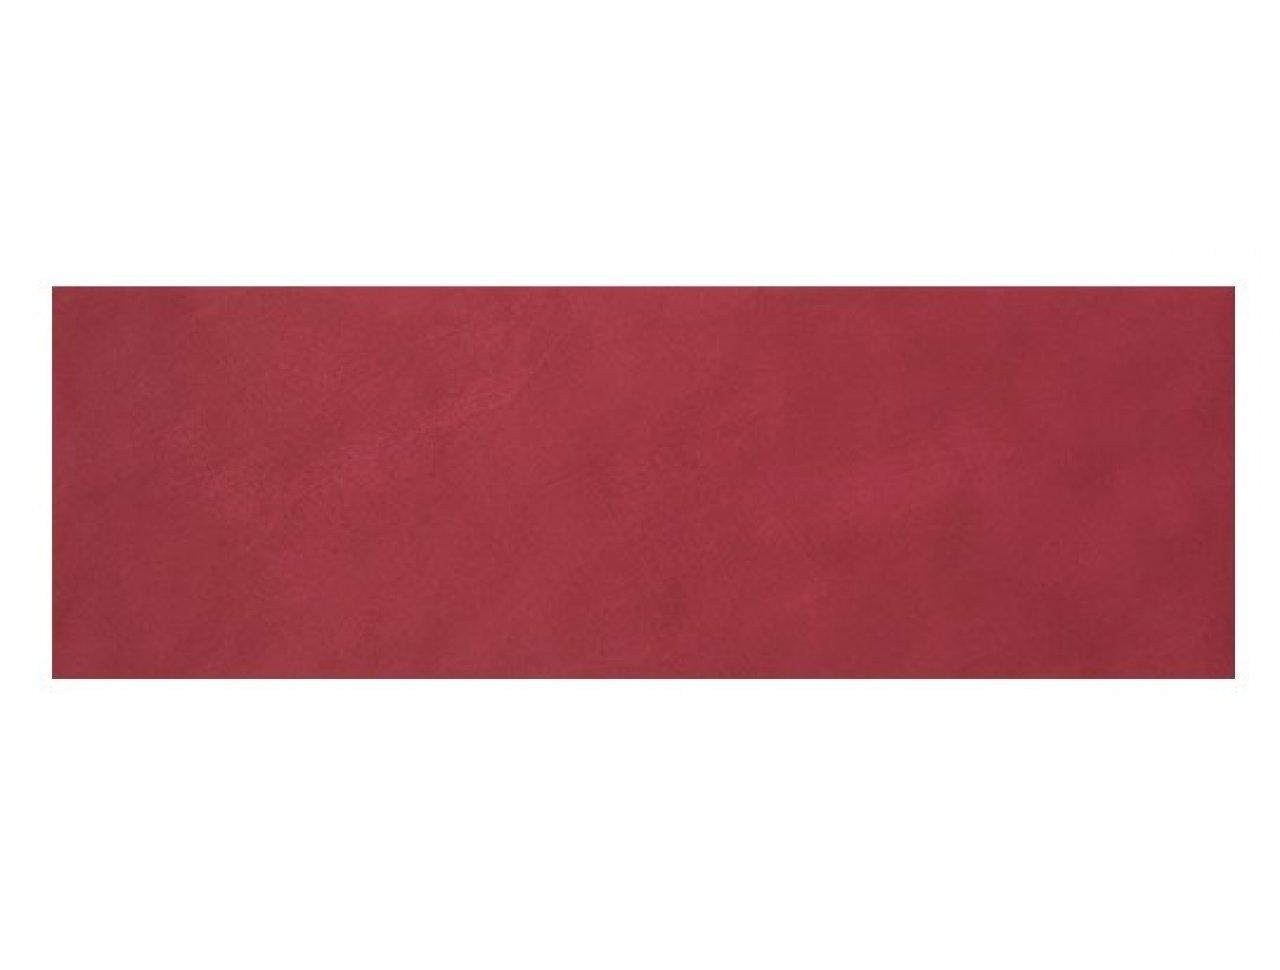 Настенная плитка FAP Color Now Marsala 30.5x91.5 см, Арт. fMRT